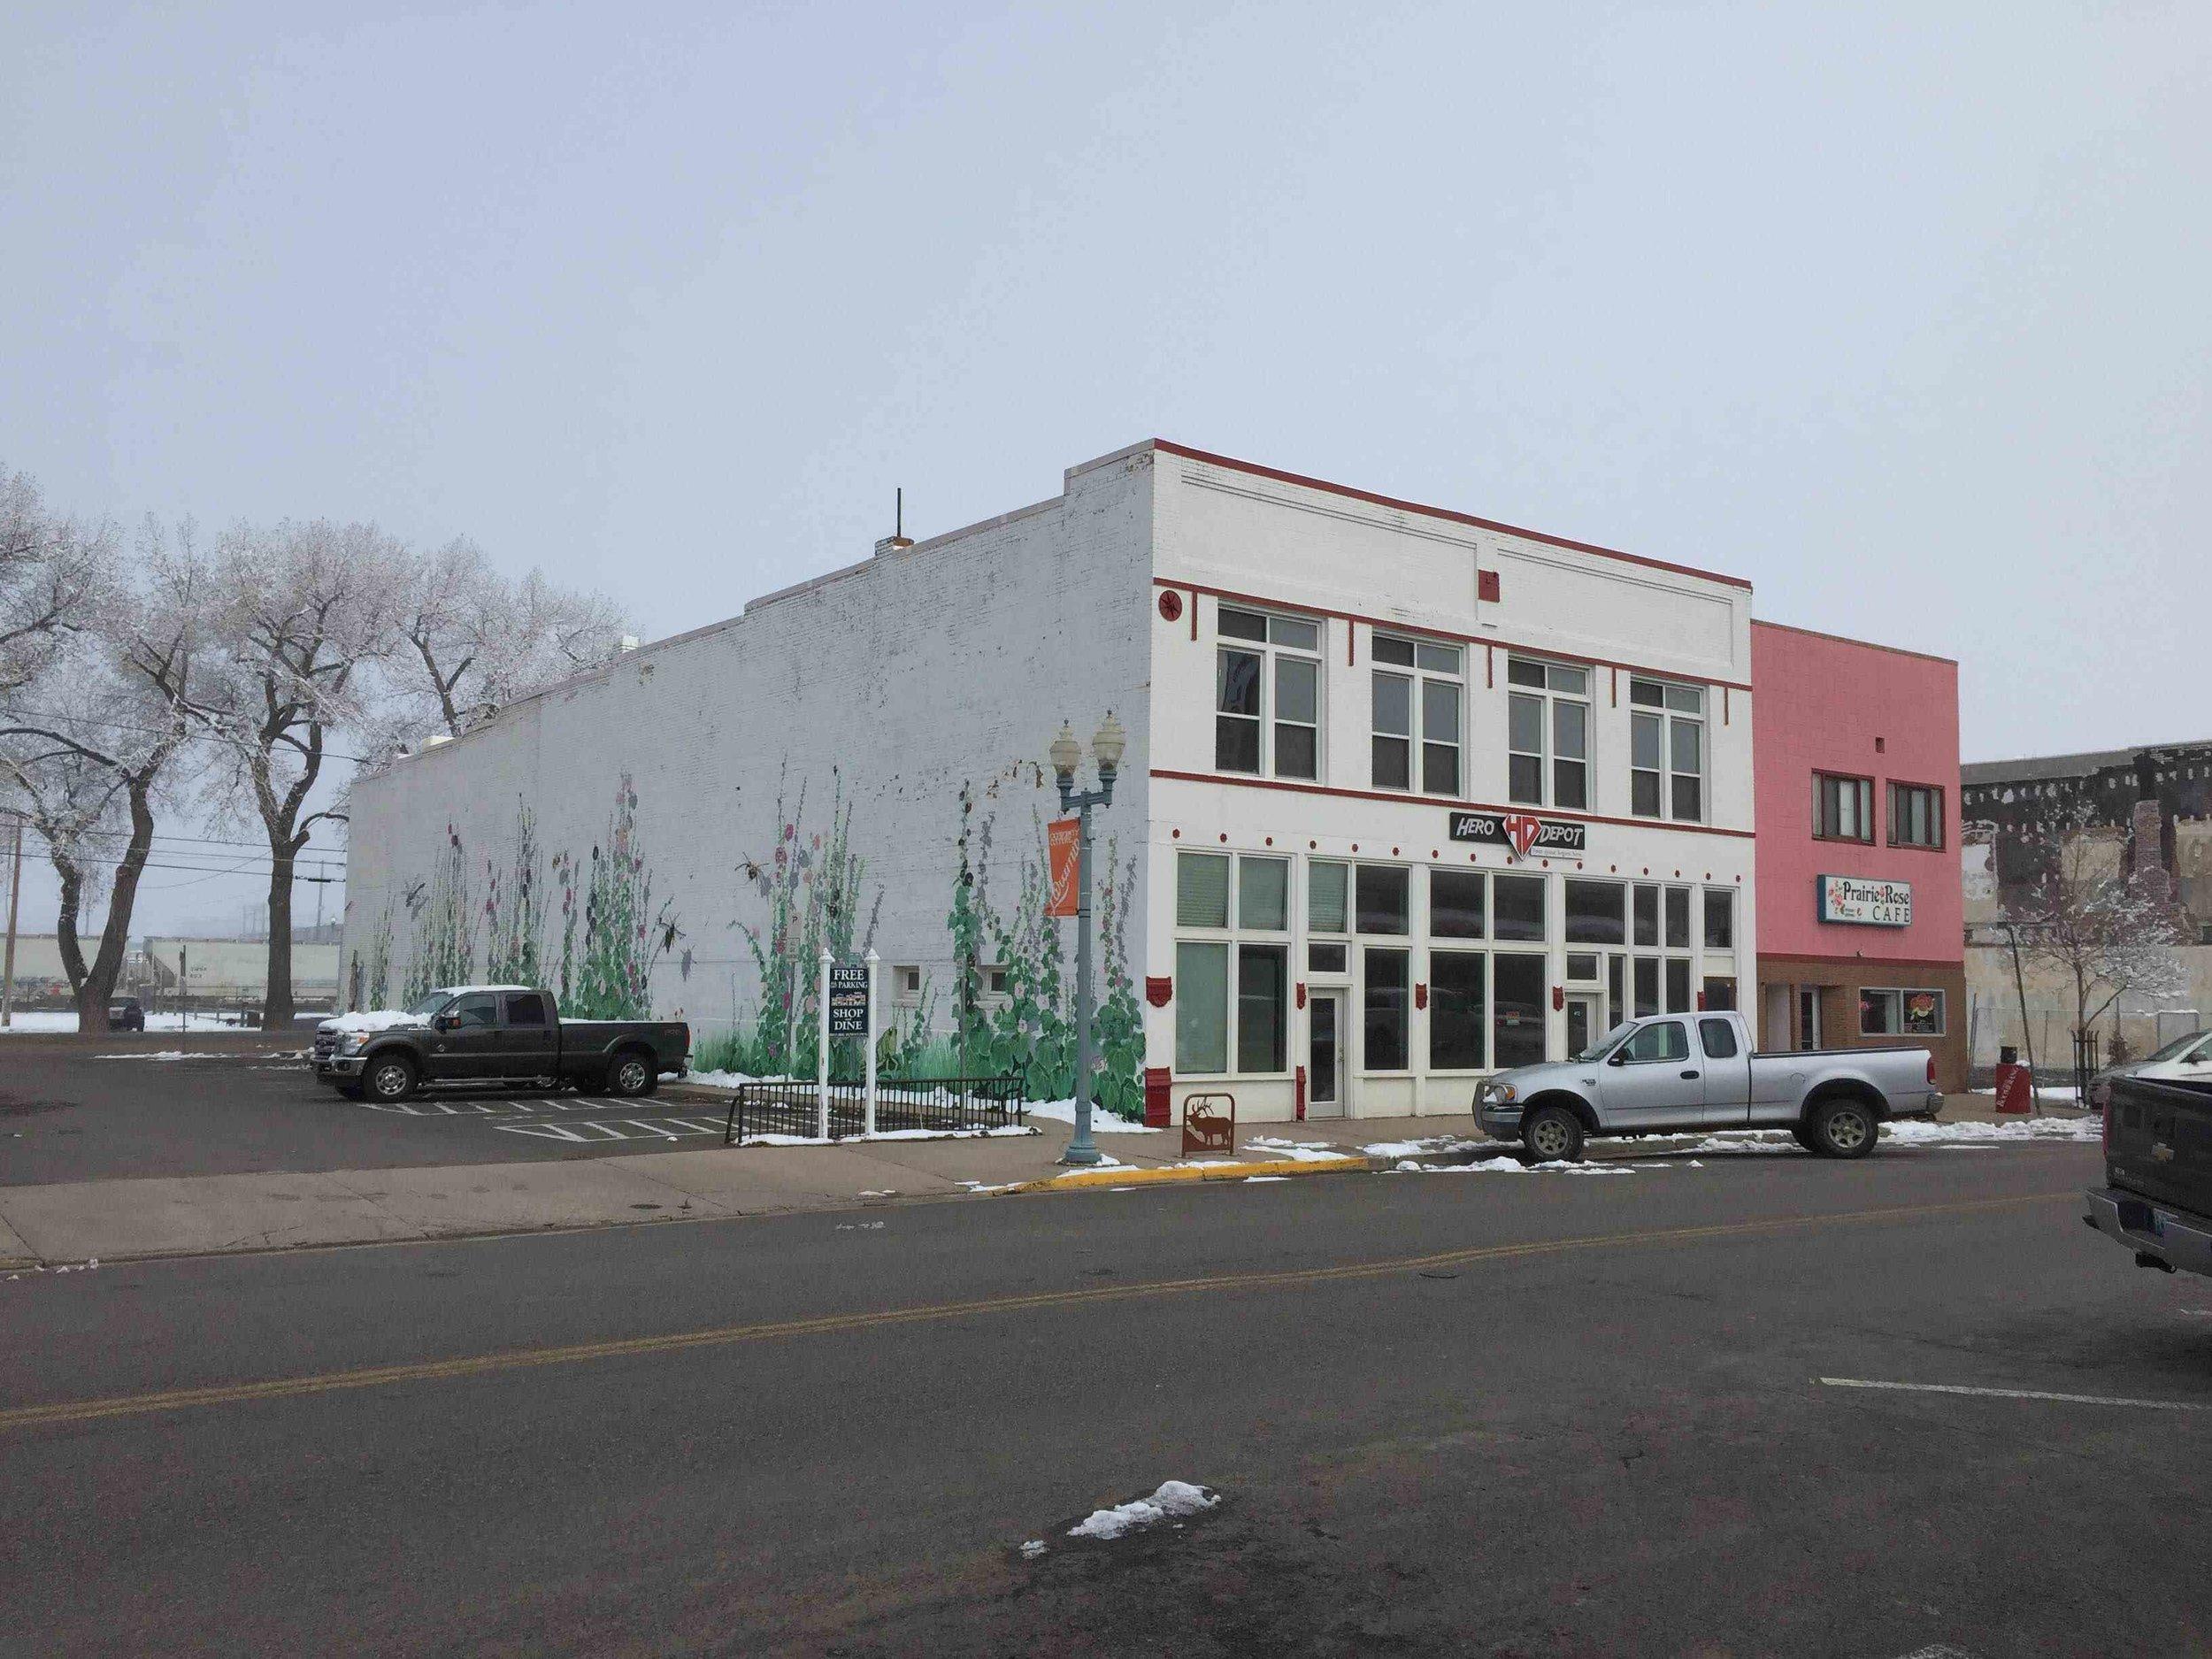 Lovejoy Building